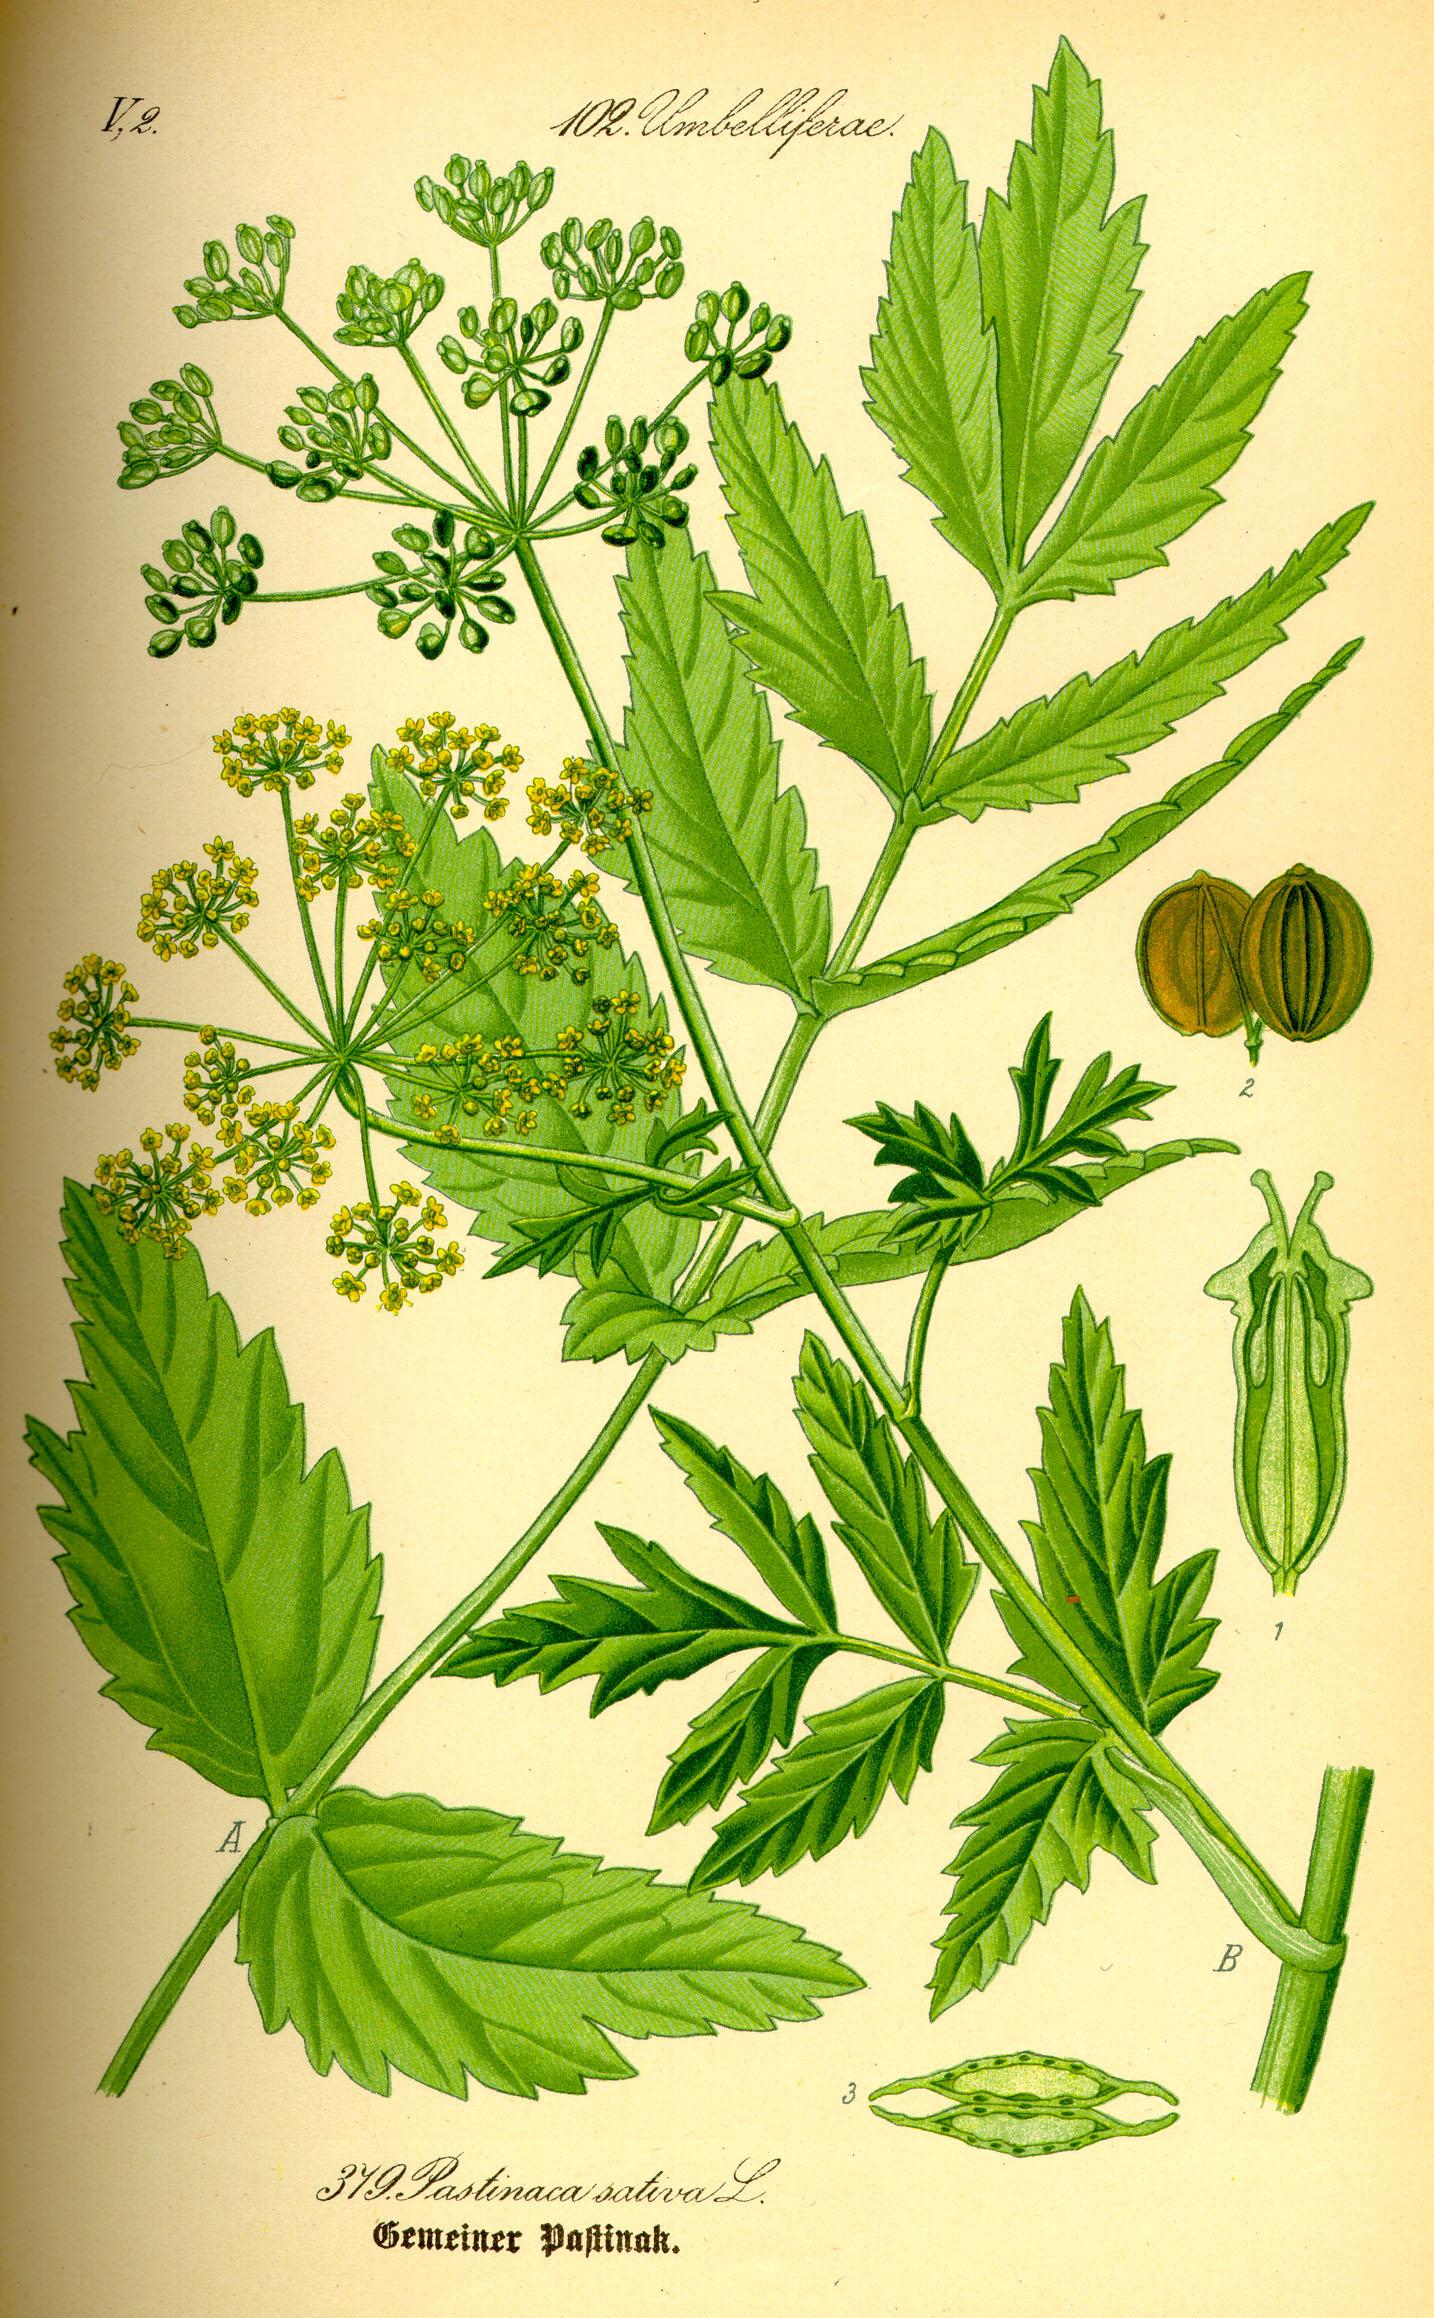 Le panais cultivé (Pastinaca sativa)